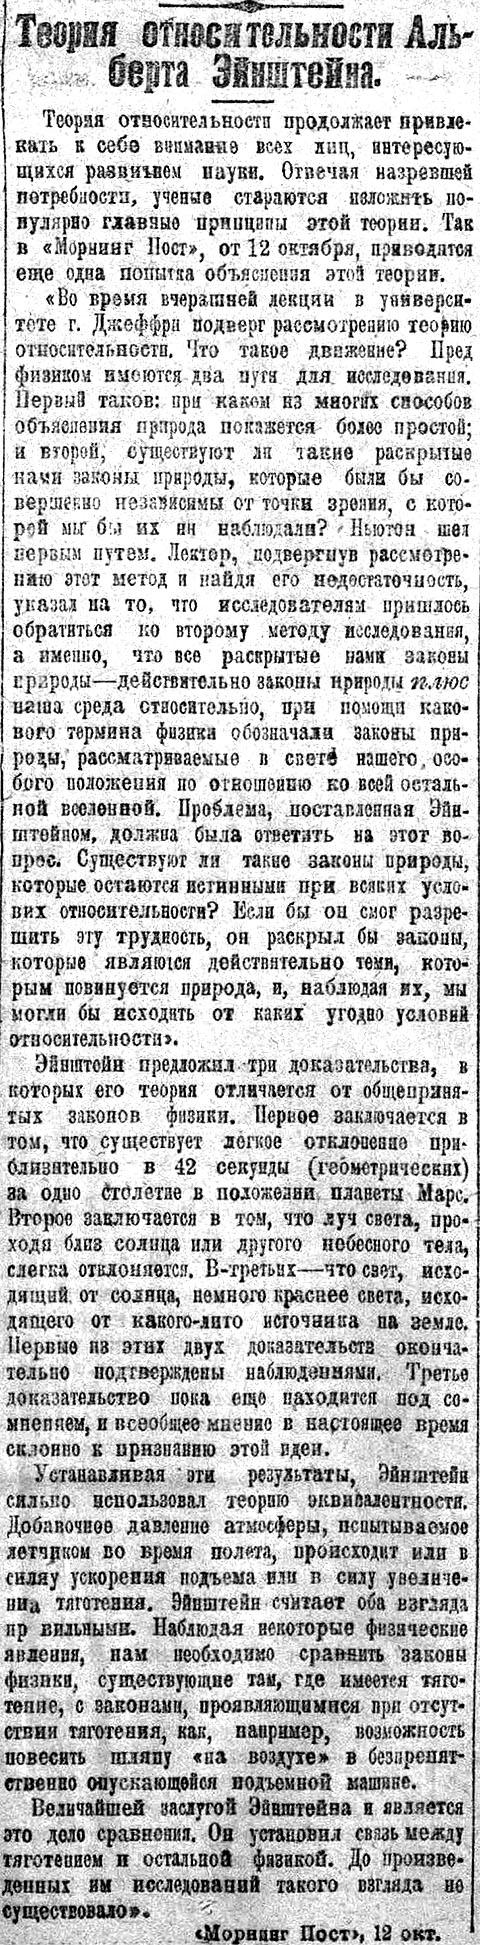 Текстовая версия здесь http://starosti.ru/article.php?id=62441